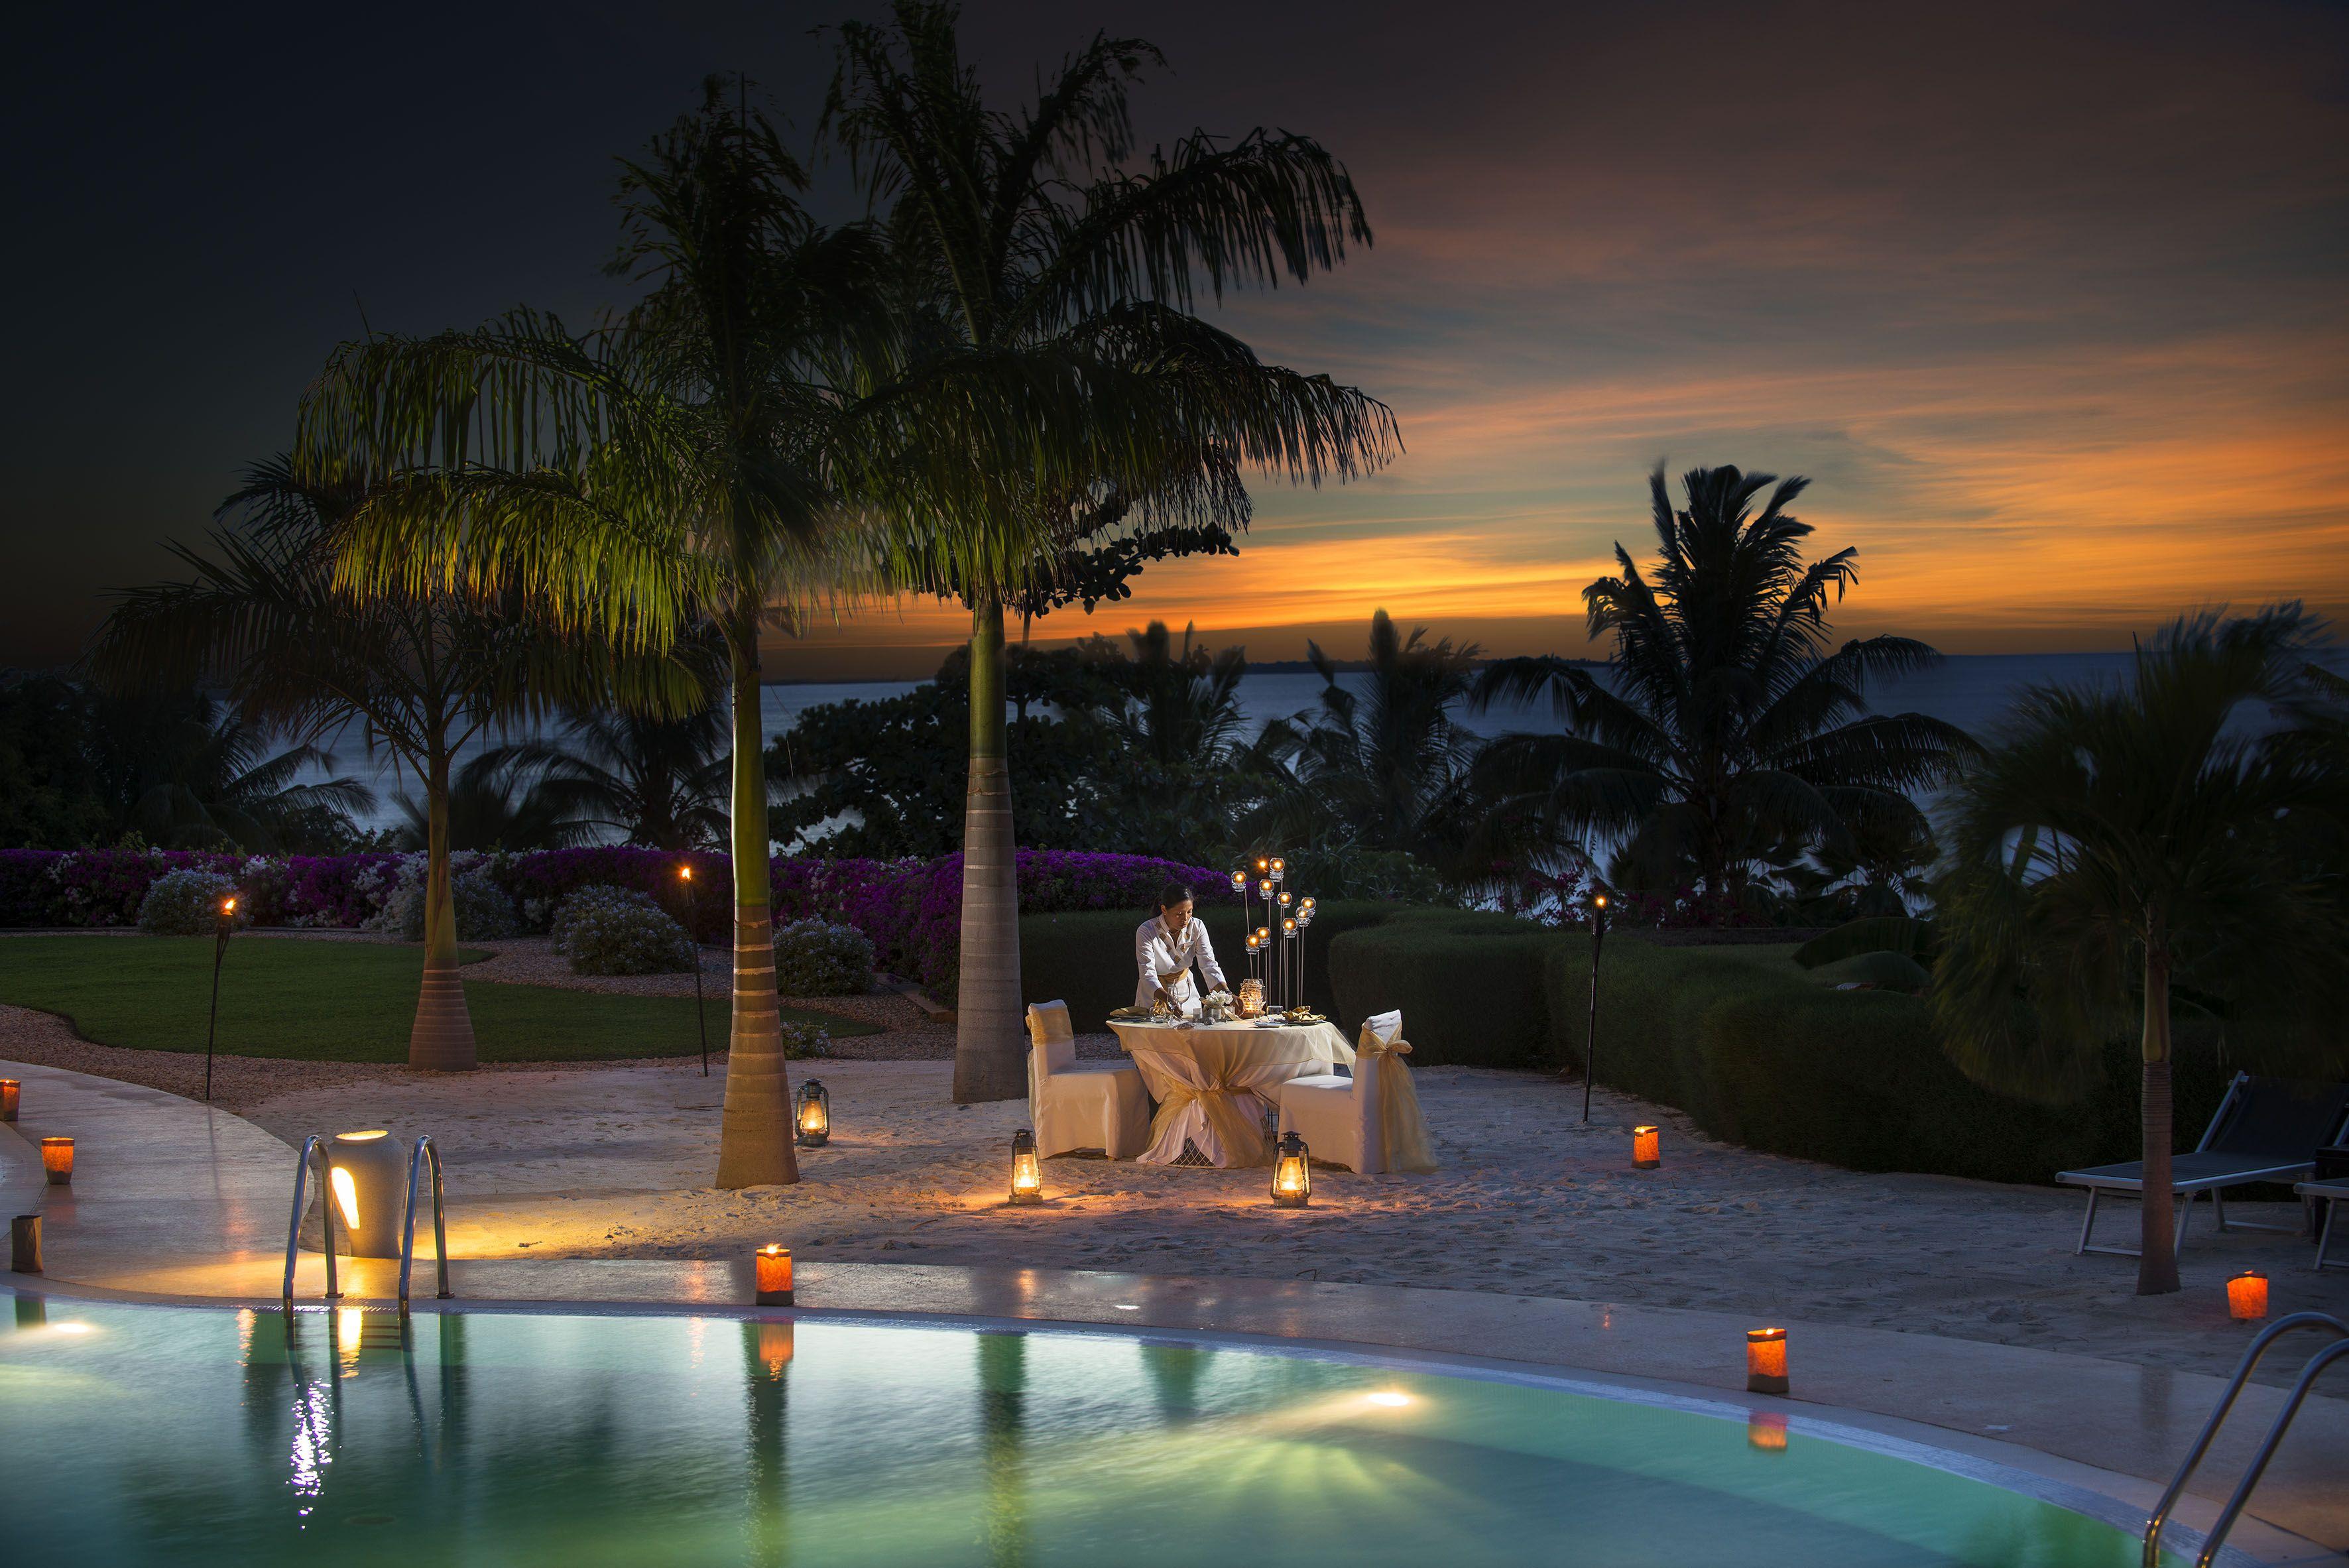 Romantic dinner under the stars on the beach!